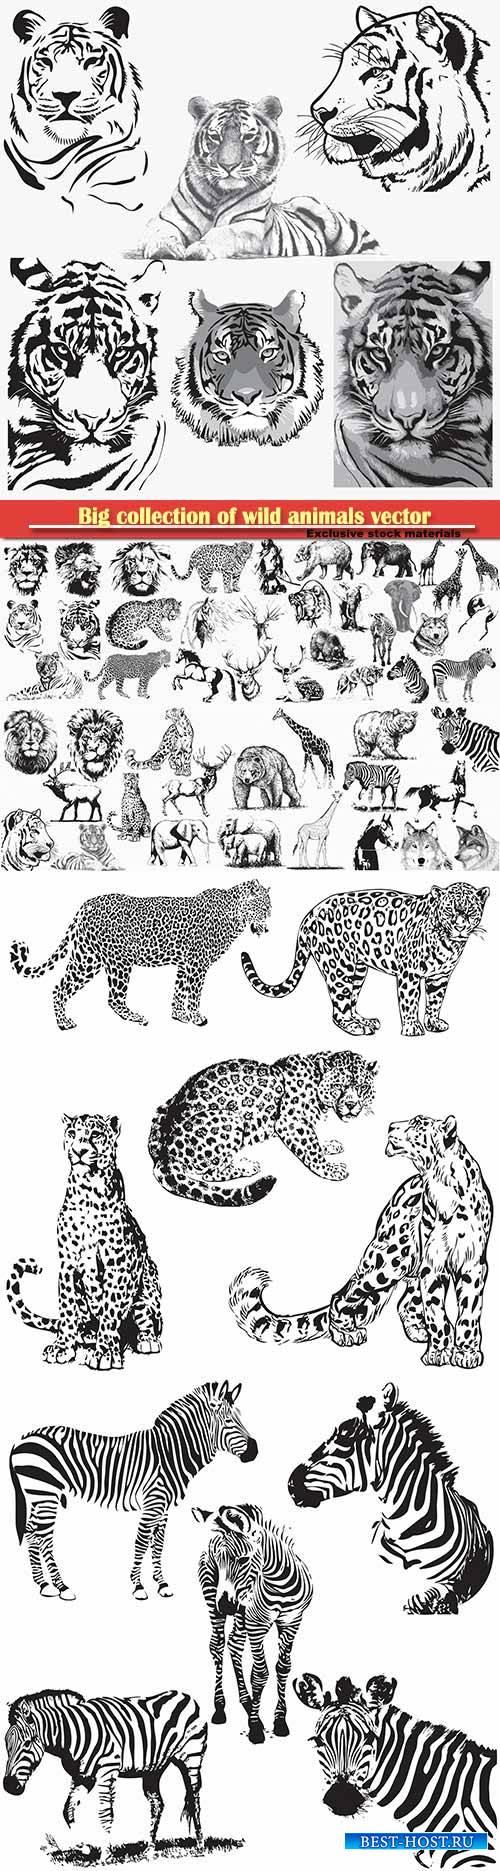 Big collection of wild animals vector illustration